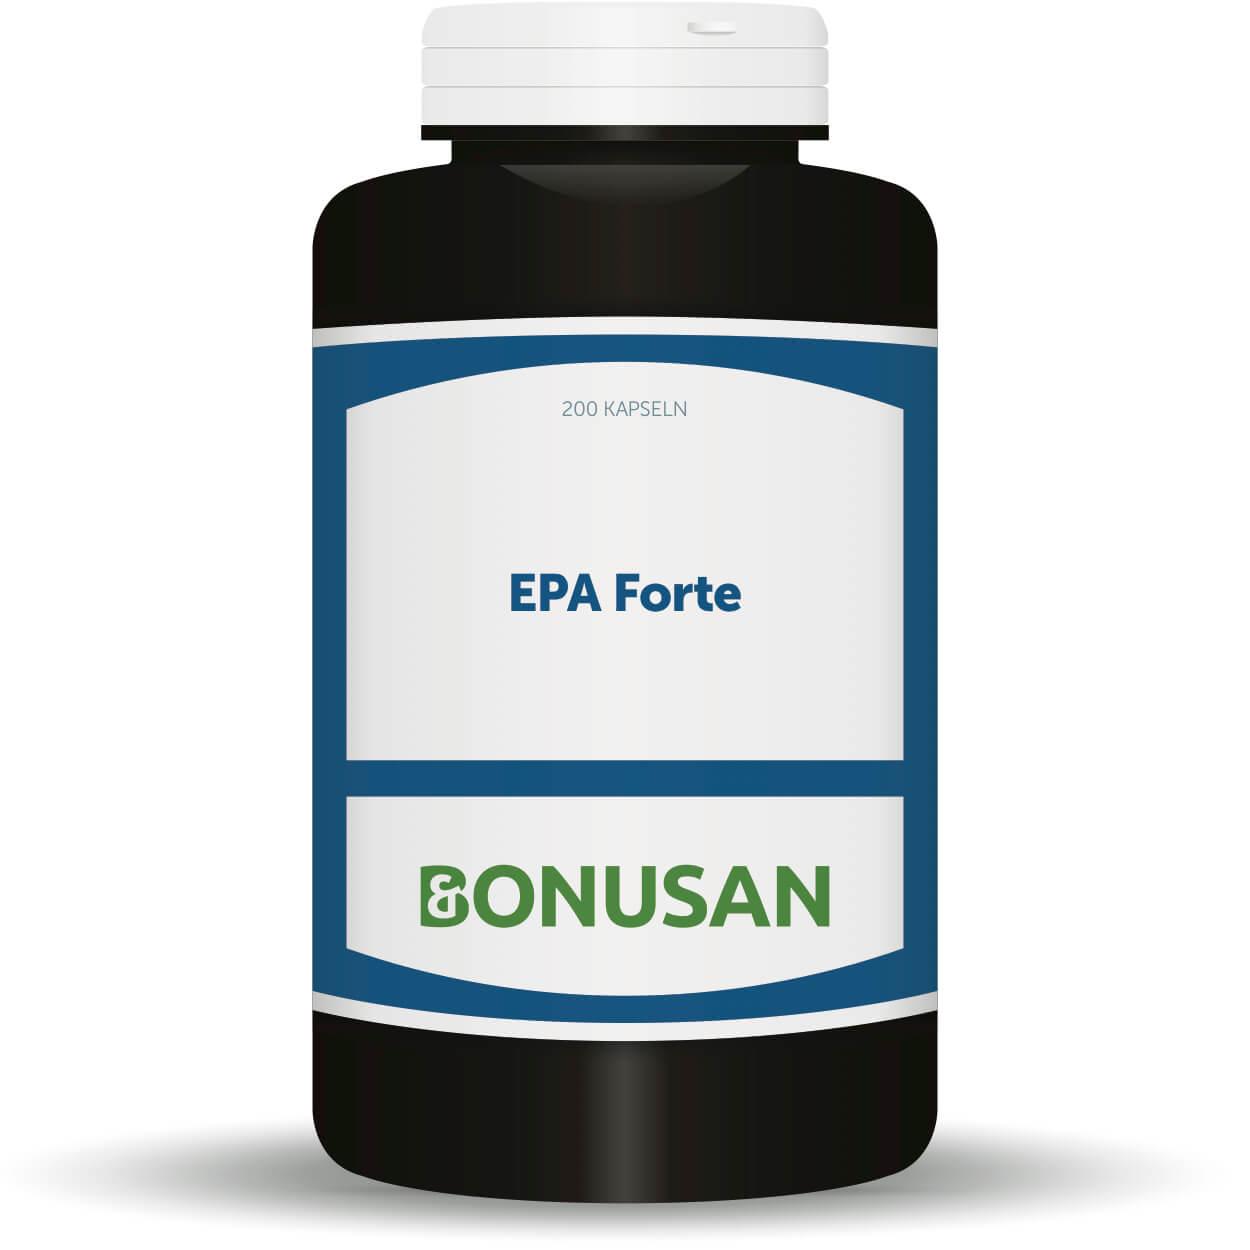 EPA Forte Großpachung